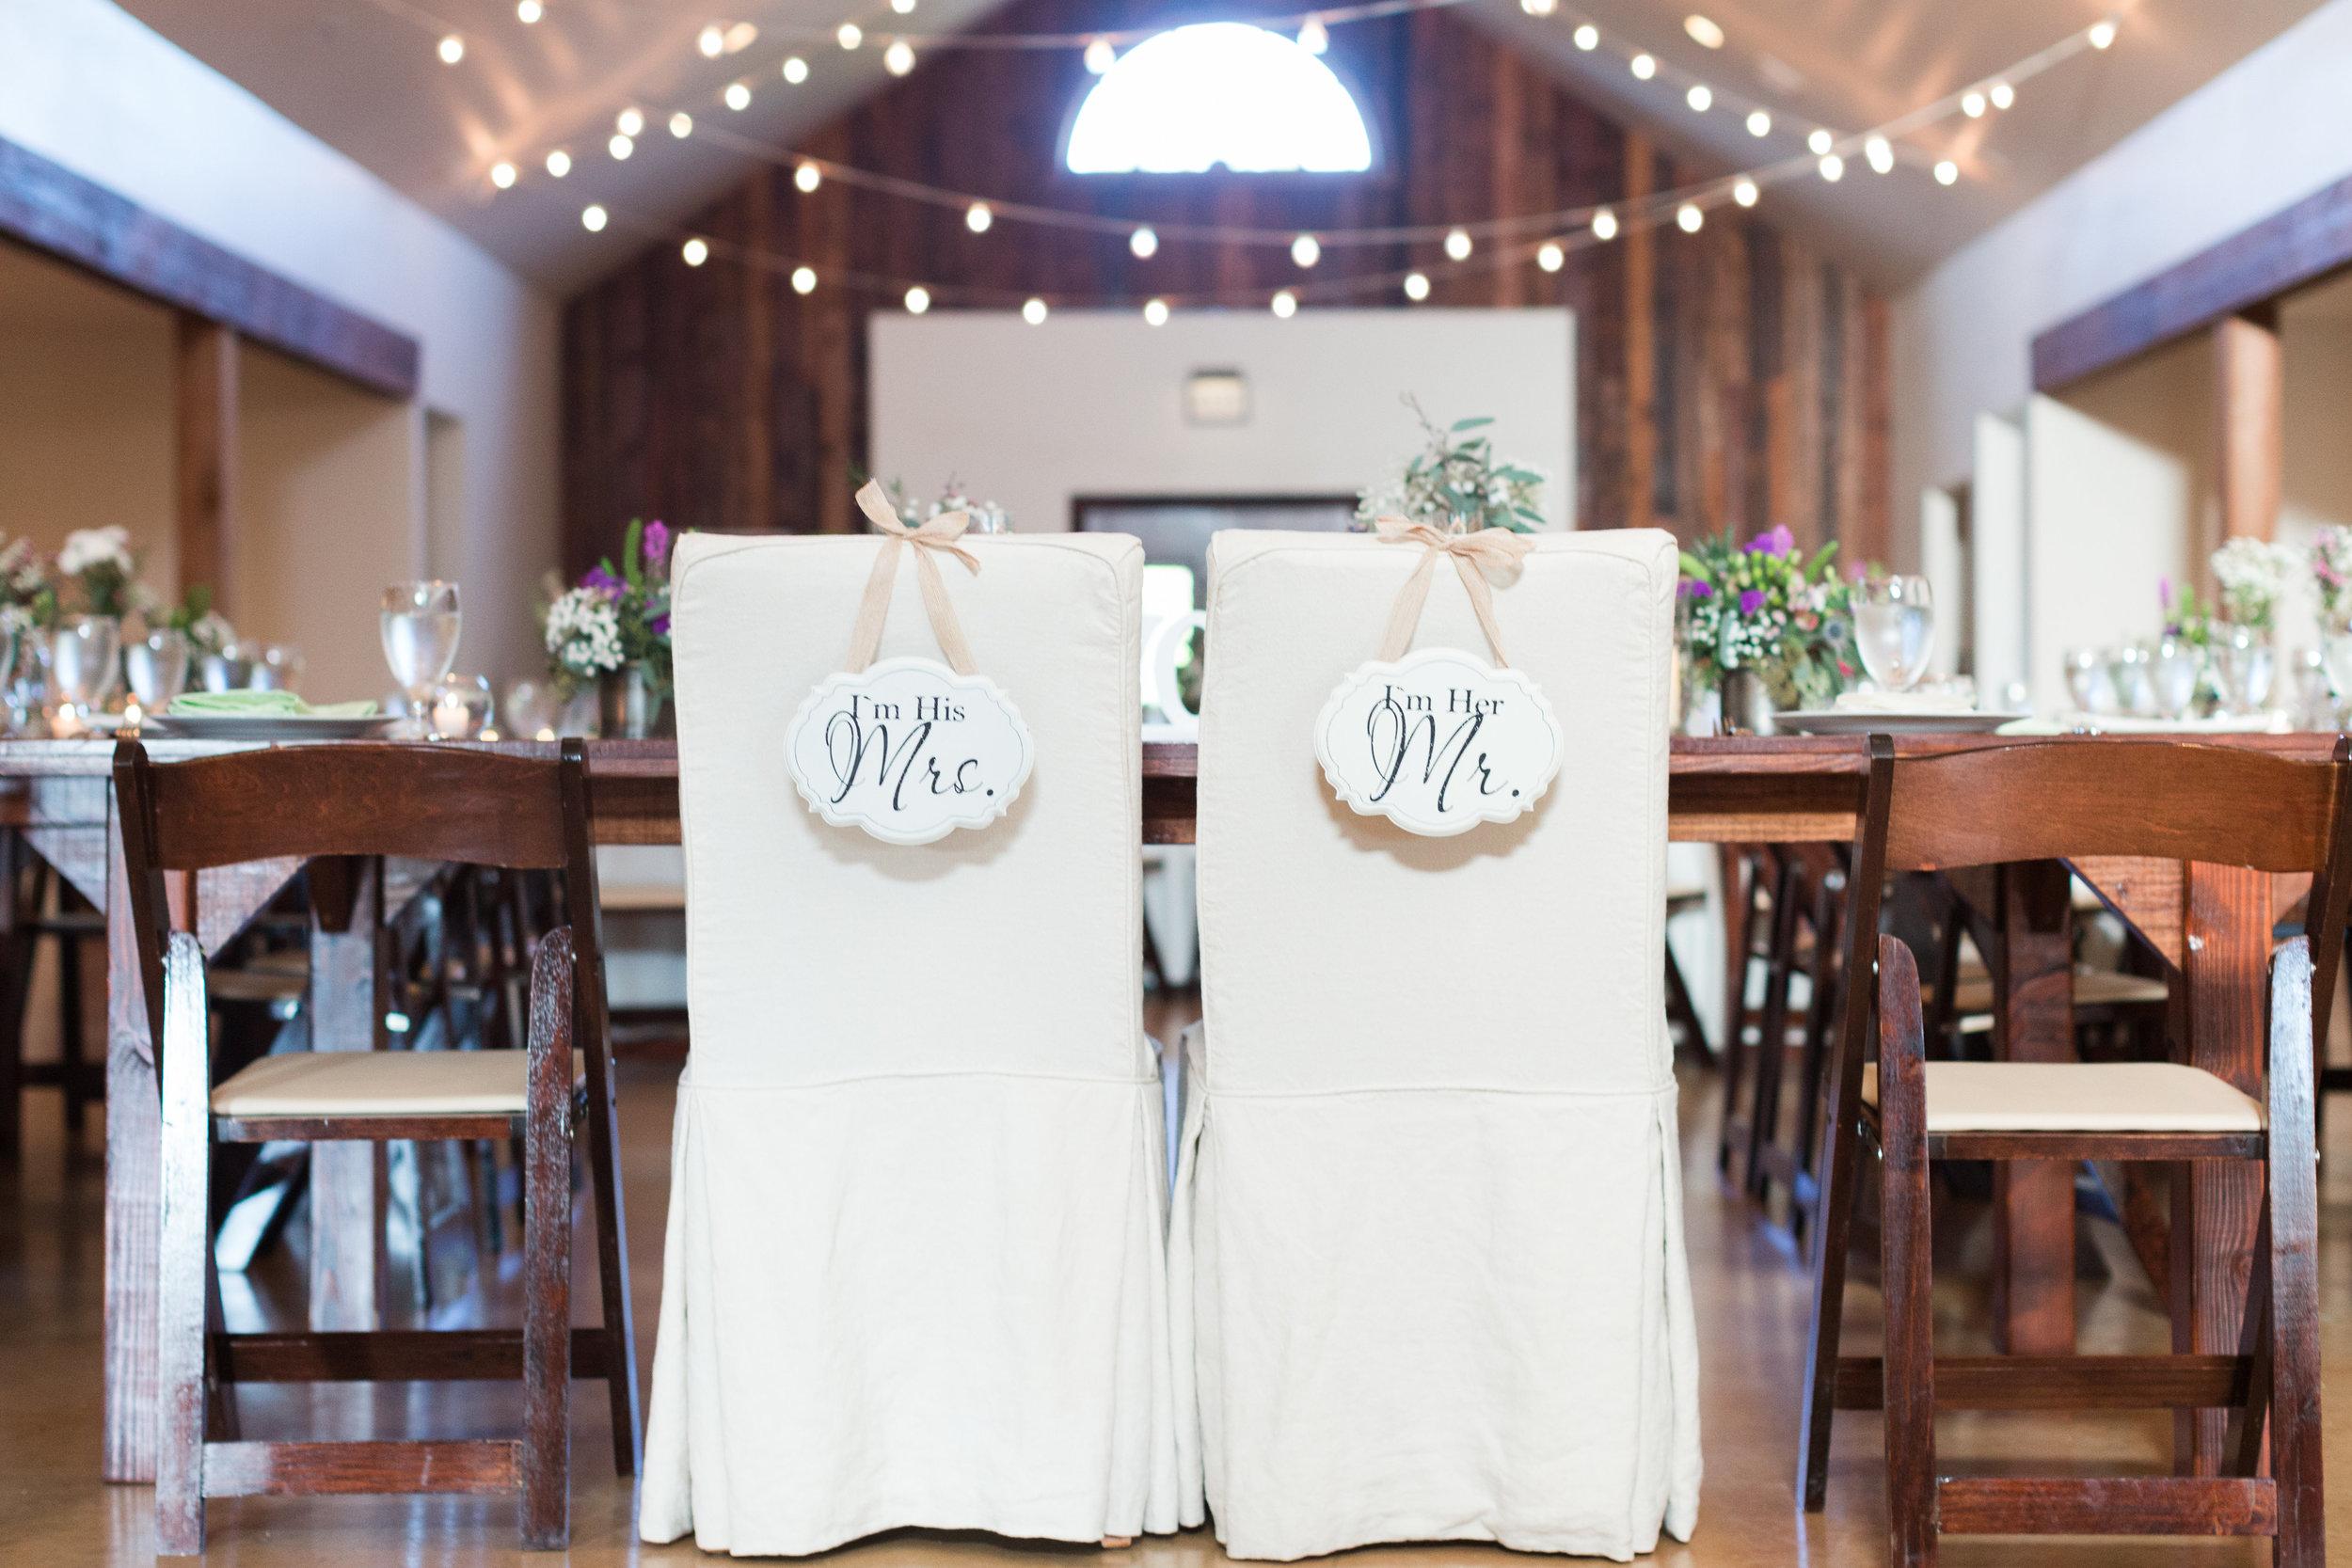 Gorgeous Rustic Wedding Decor - Heritage House Wedding - Georgetown, Texas Wedding Venue